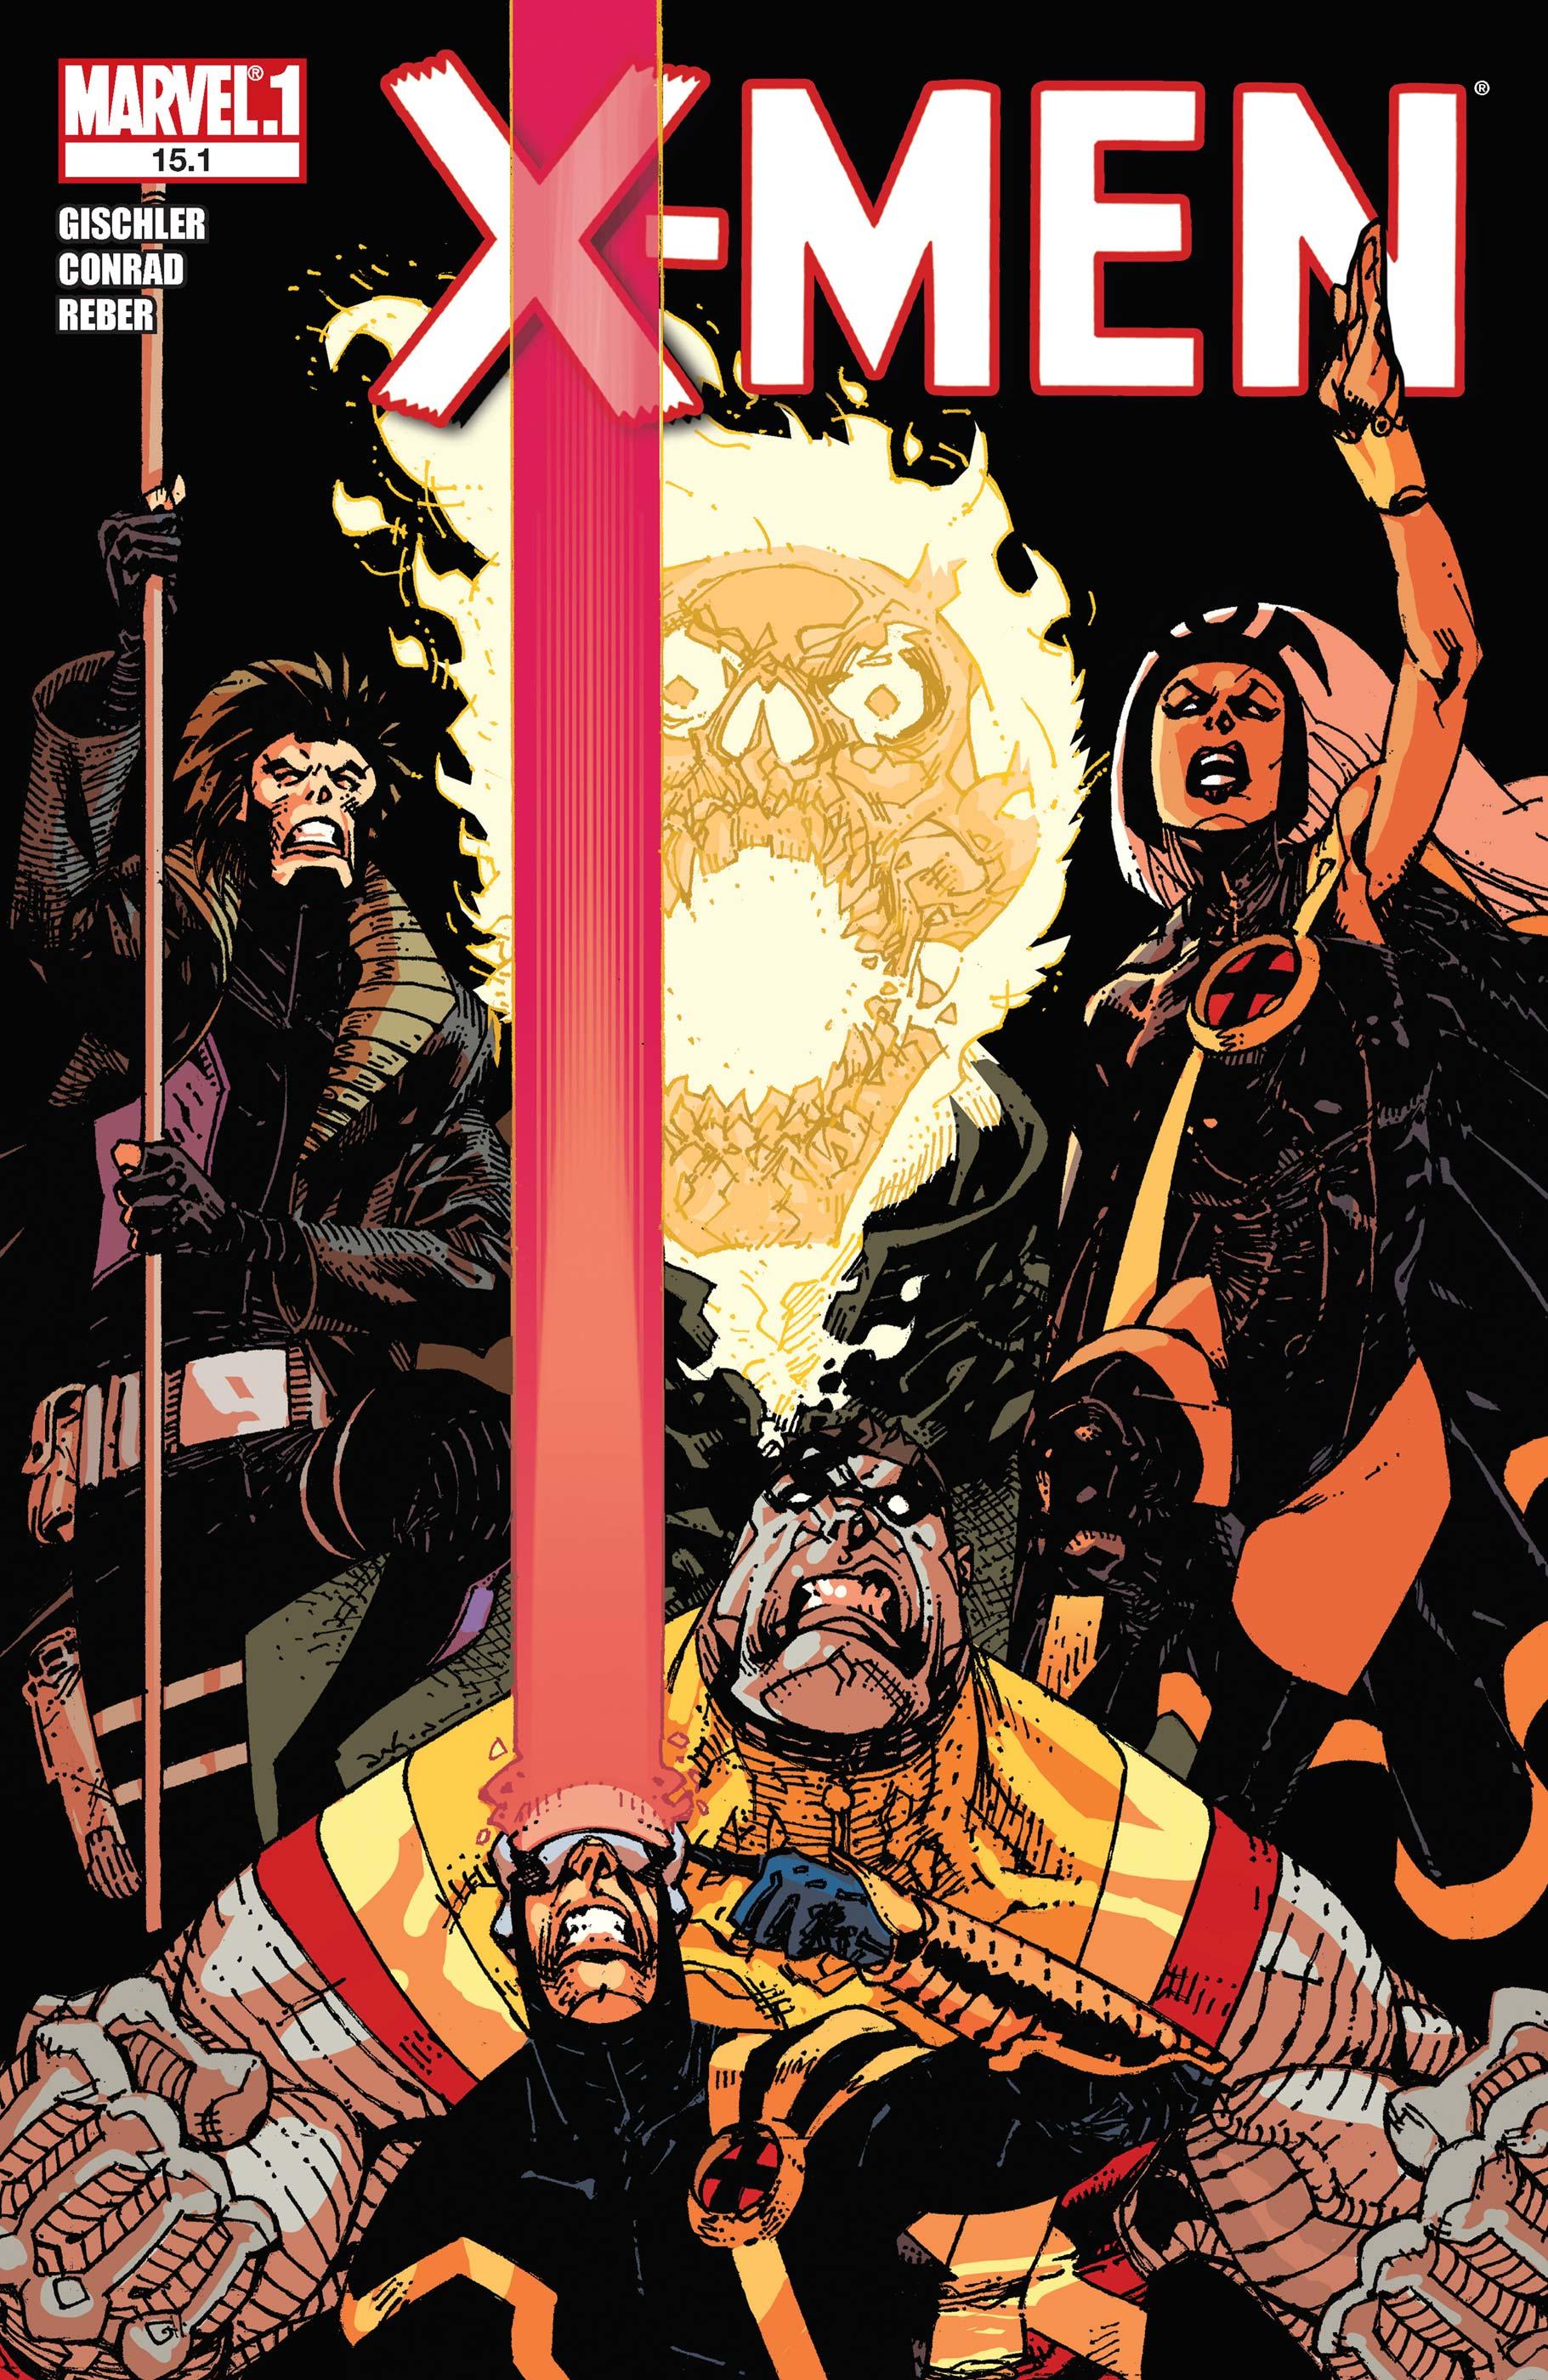 X-Men (2010) #15.1